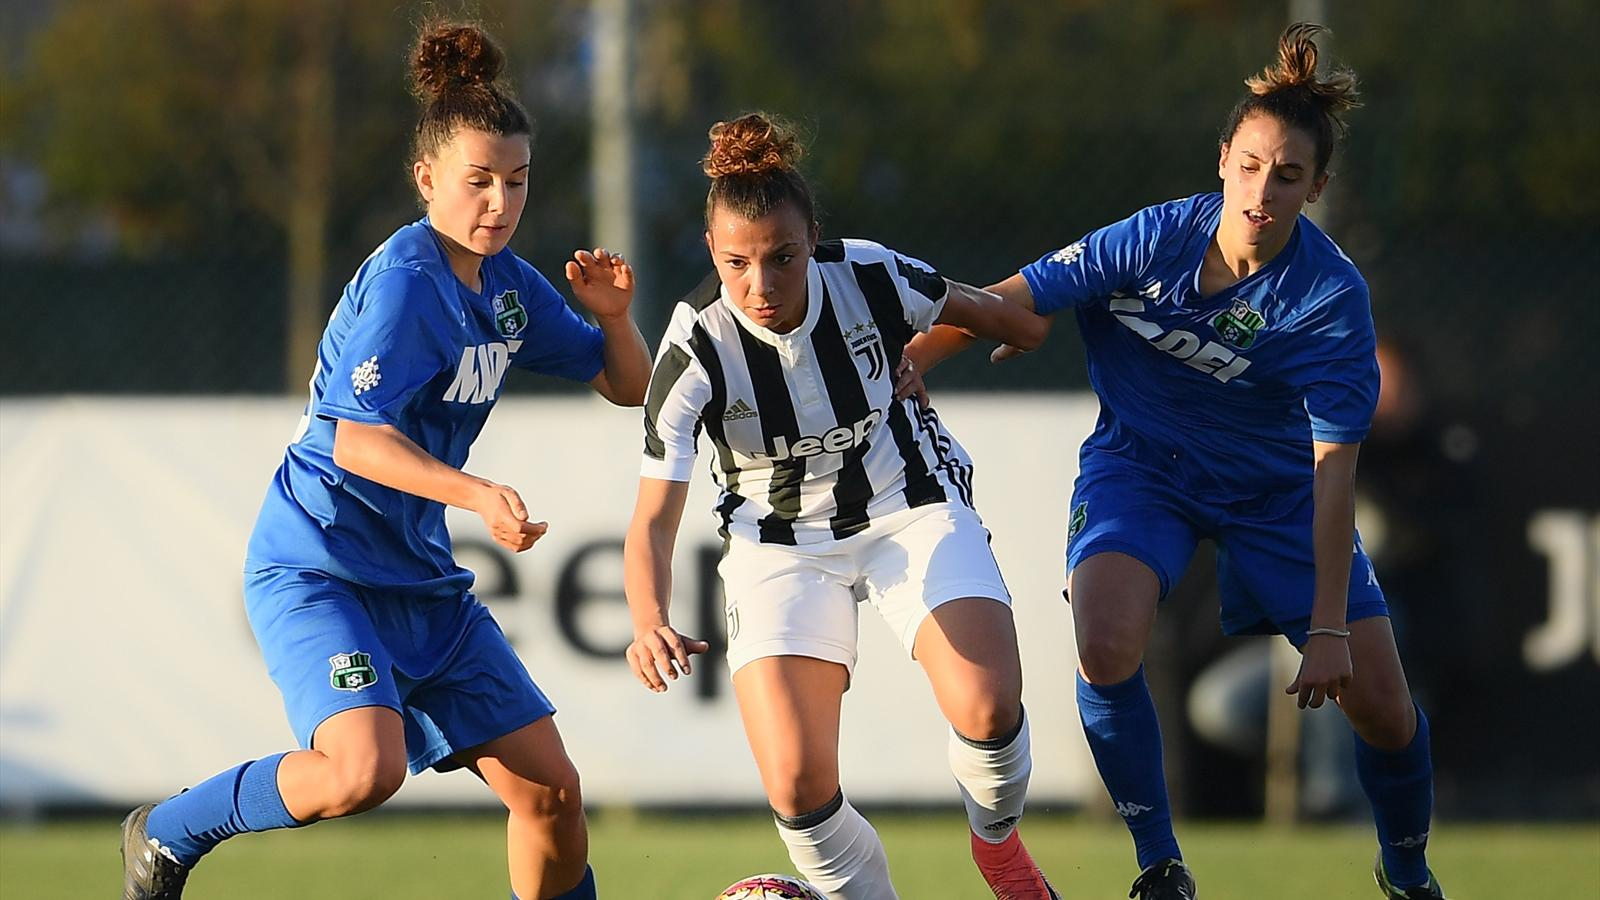 Calendario Calcio Femminile Serie B.Calcio Femminile Sospesi I Campionati Di Serie A E Di Serie